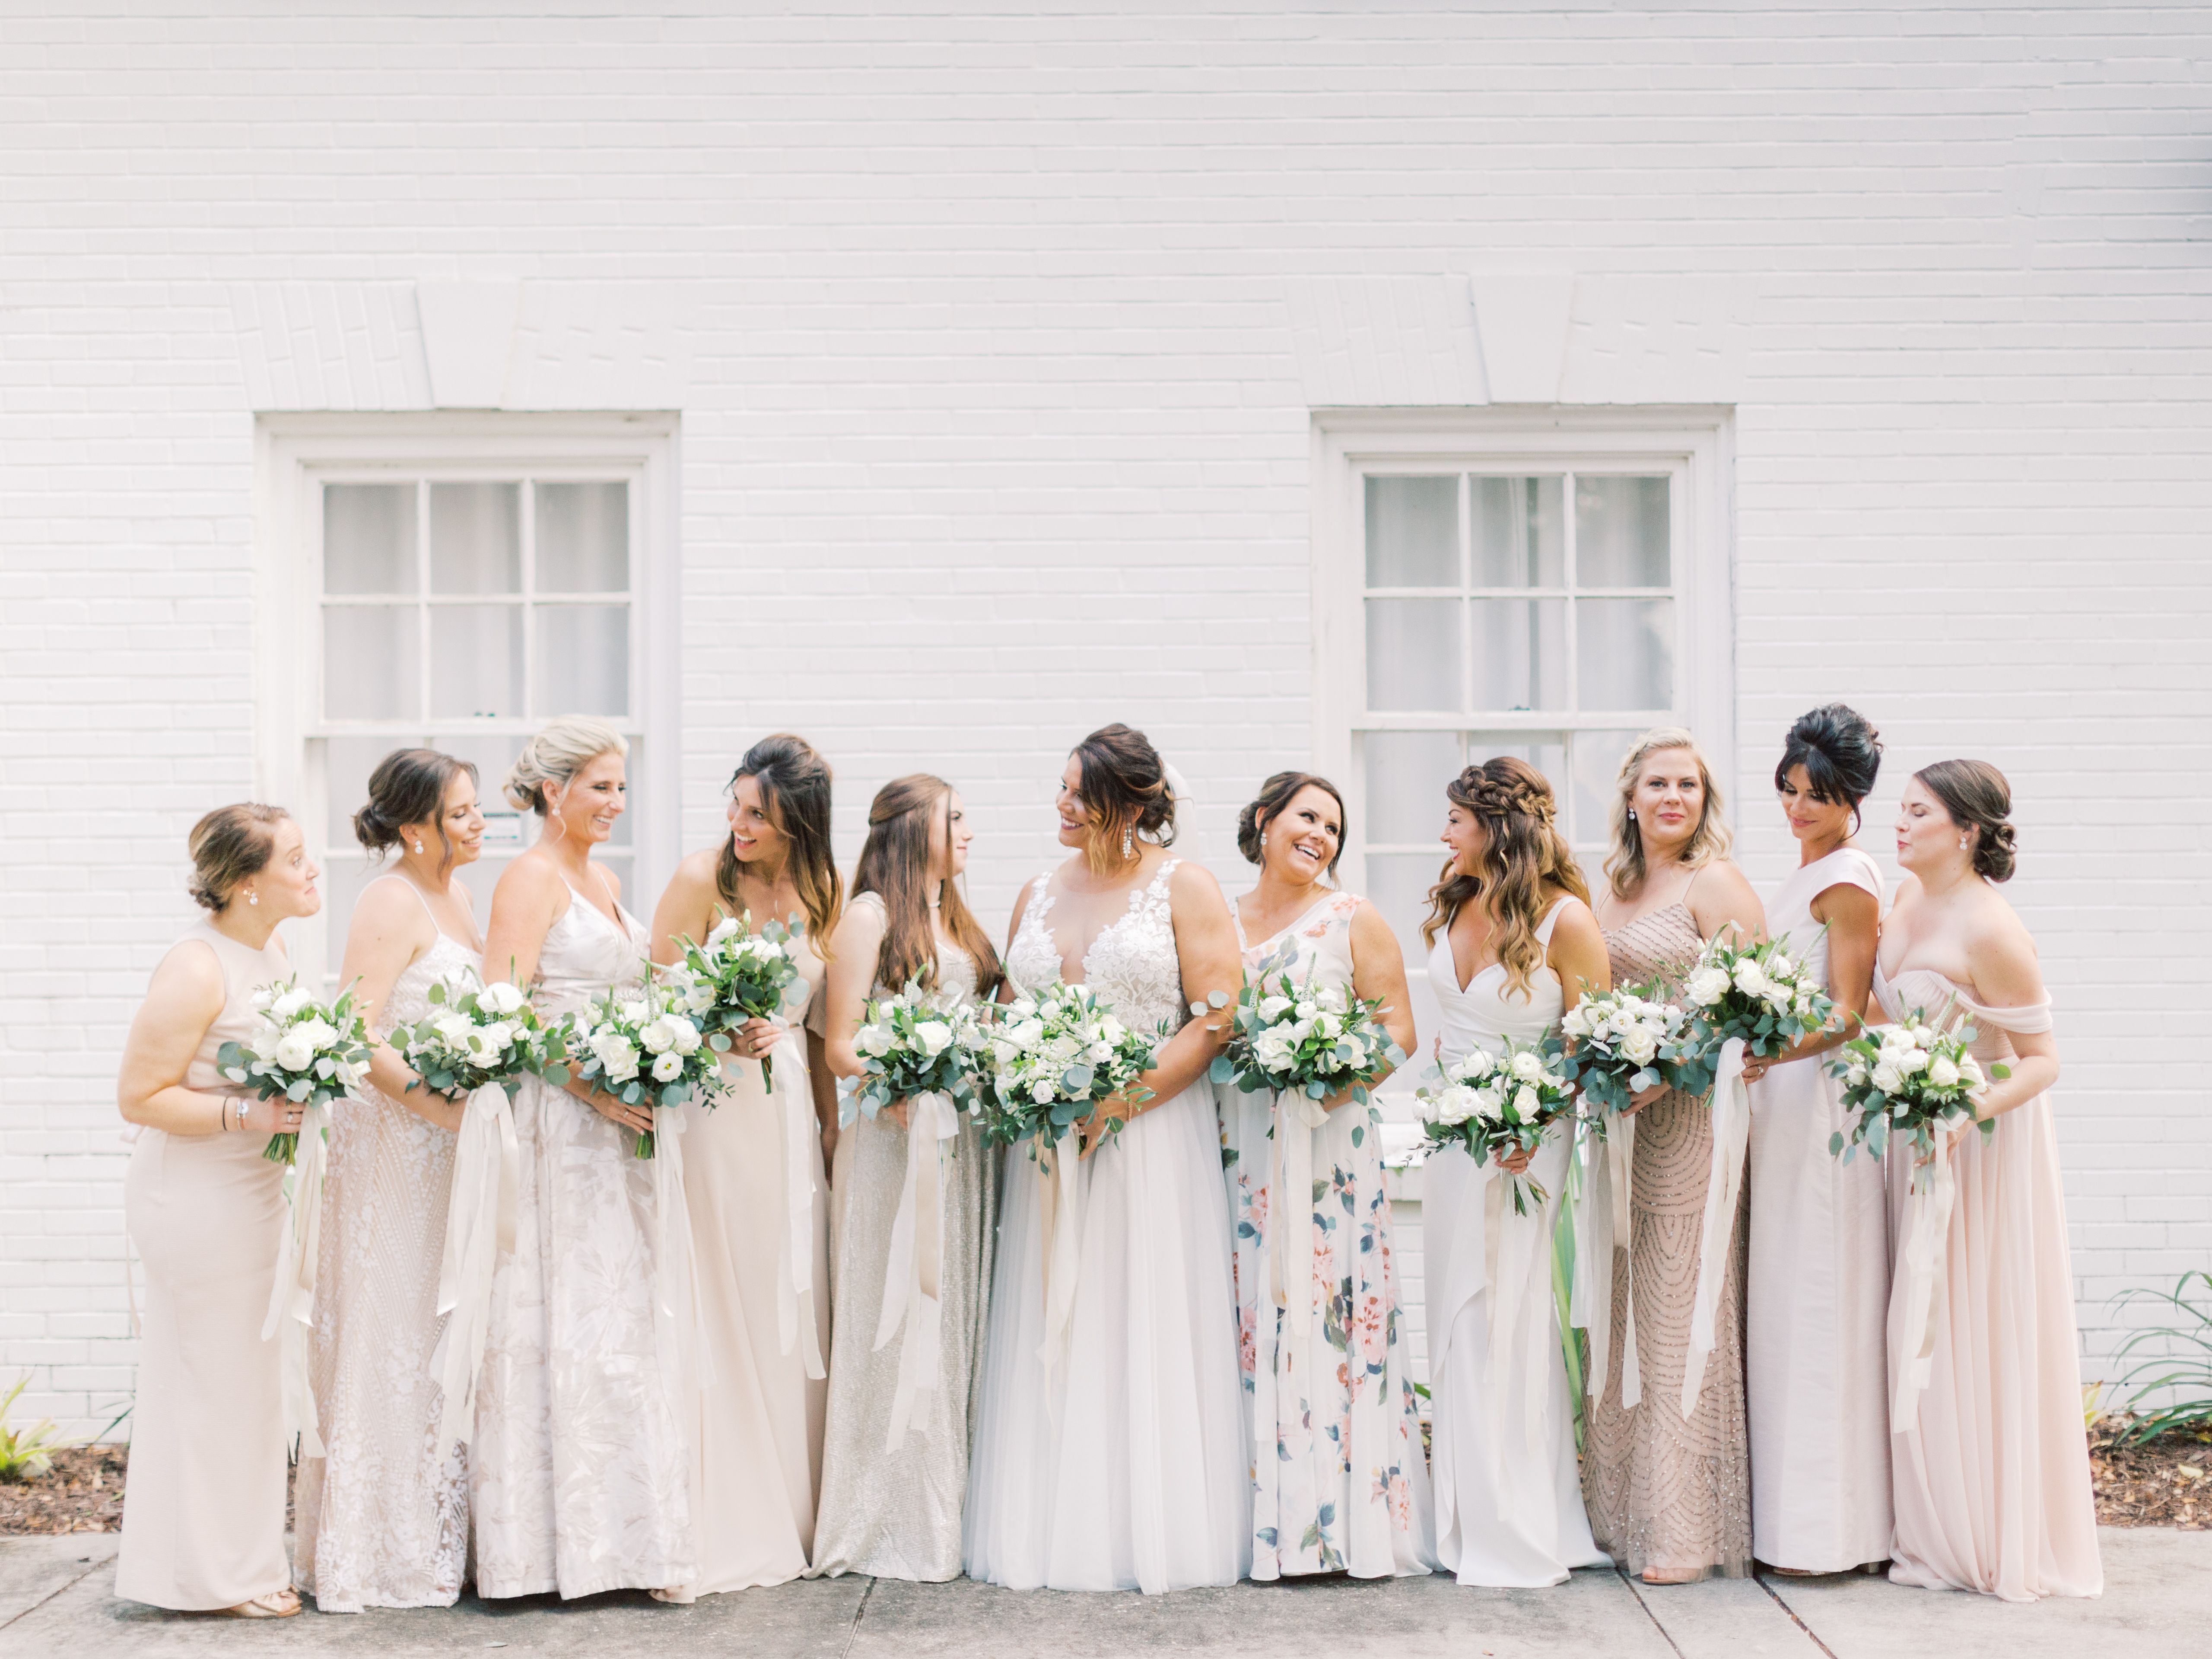 Neutral Bridesmaids Dresses Riverfront Wedding Neutral Bridesmaid Dresses Bridesmaid Dresses